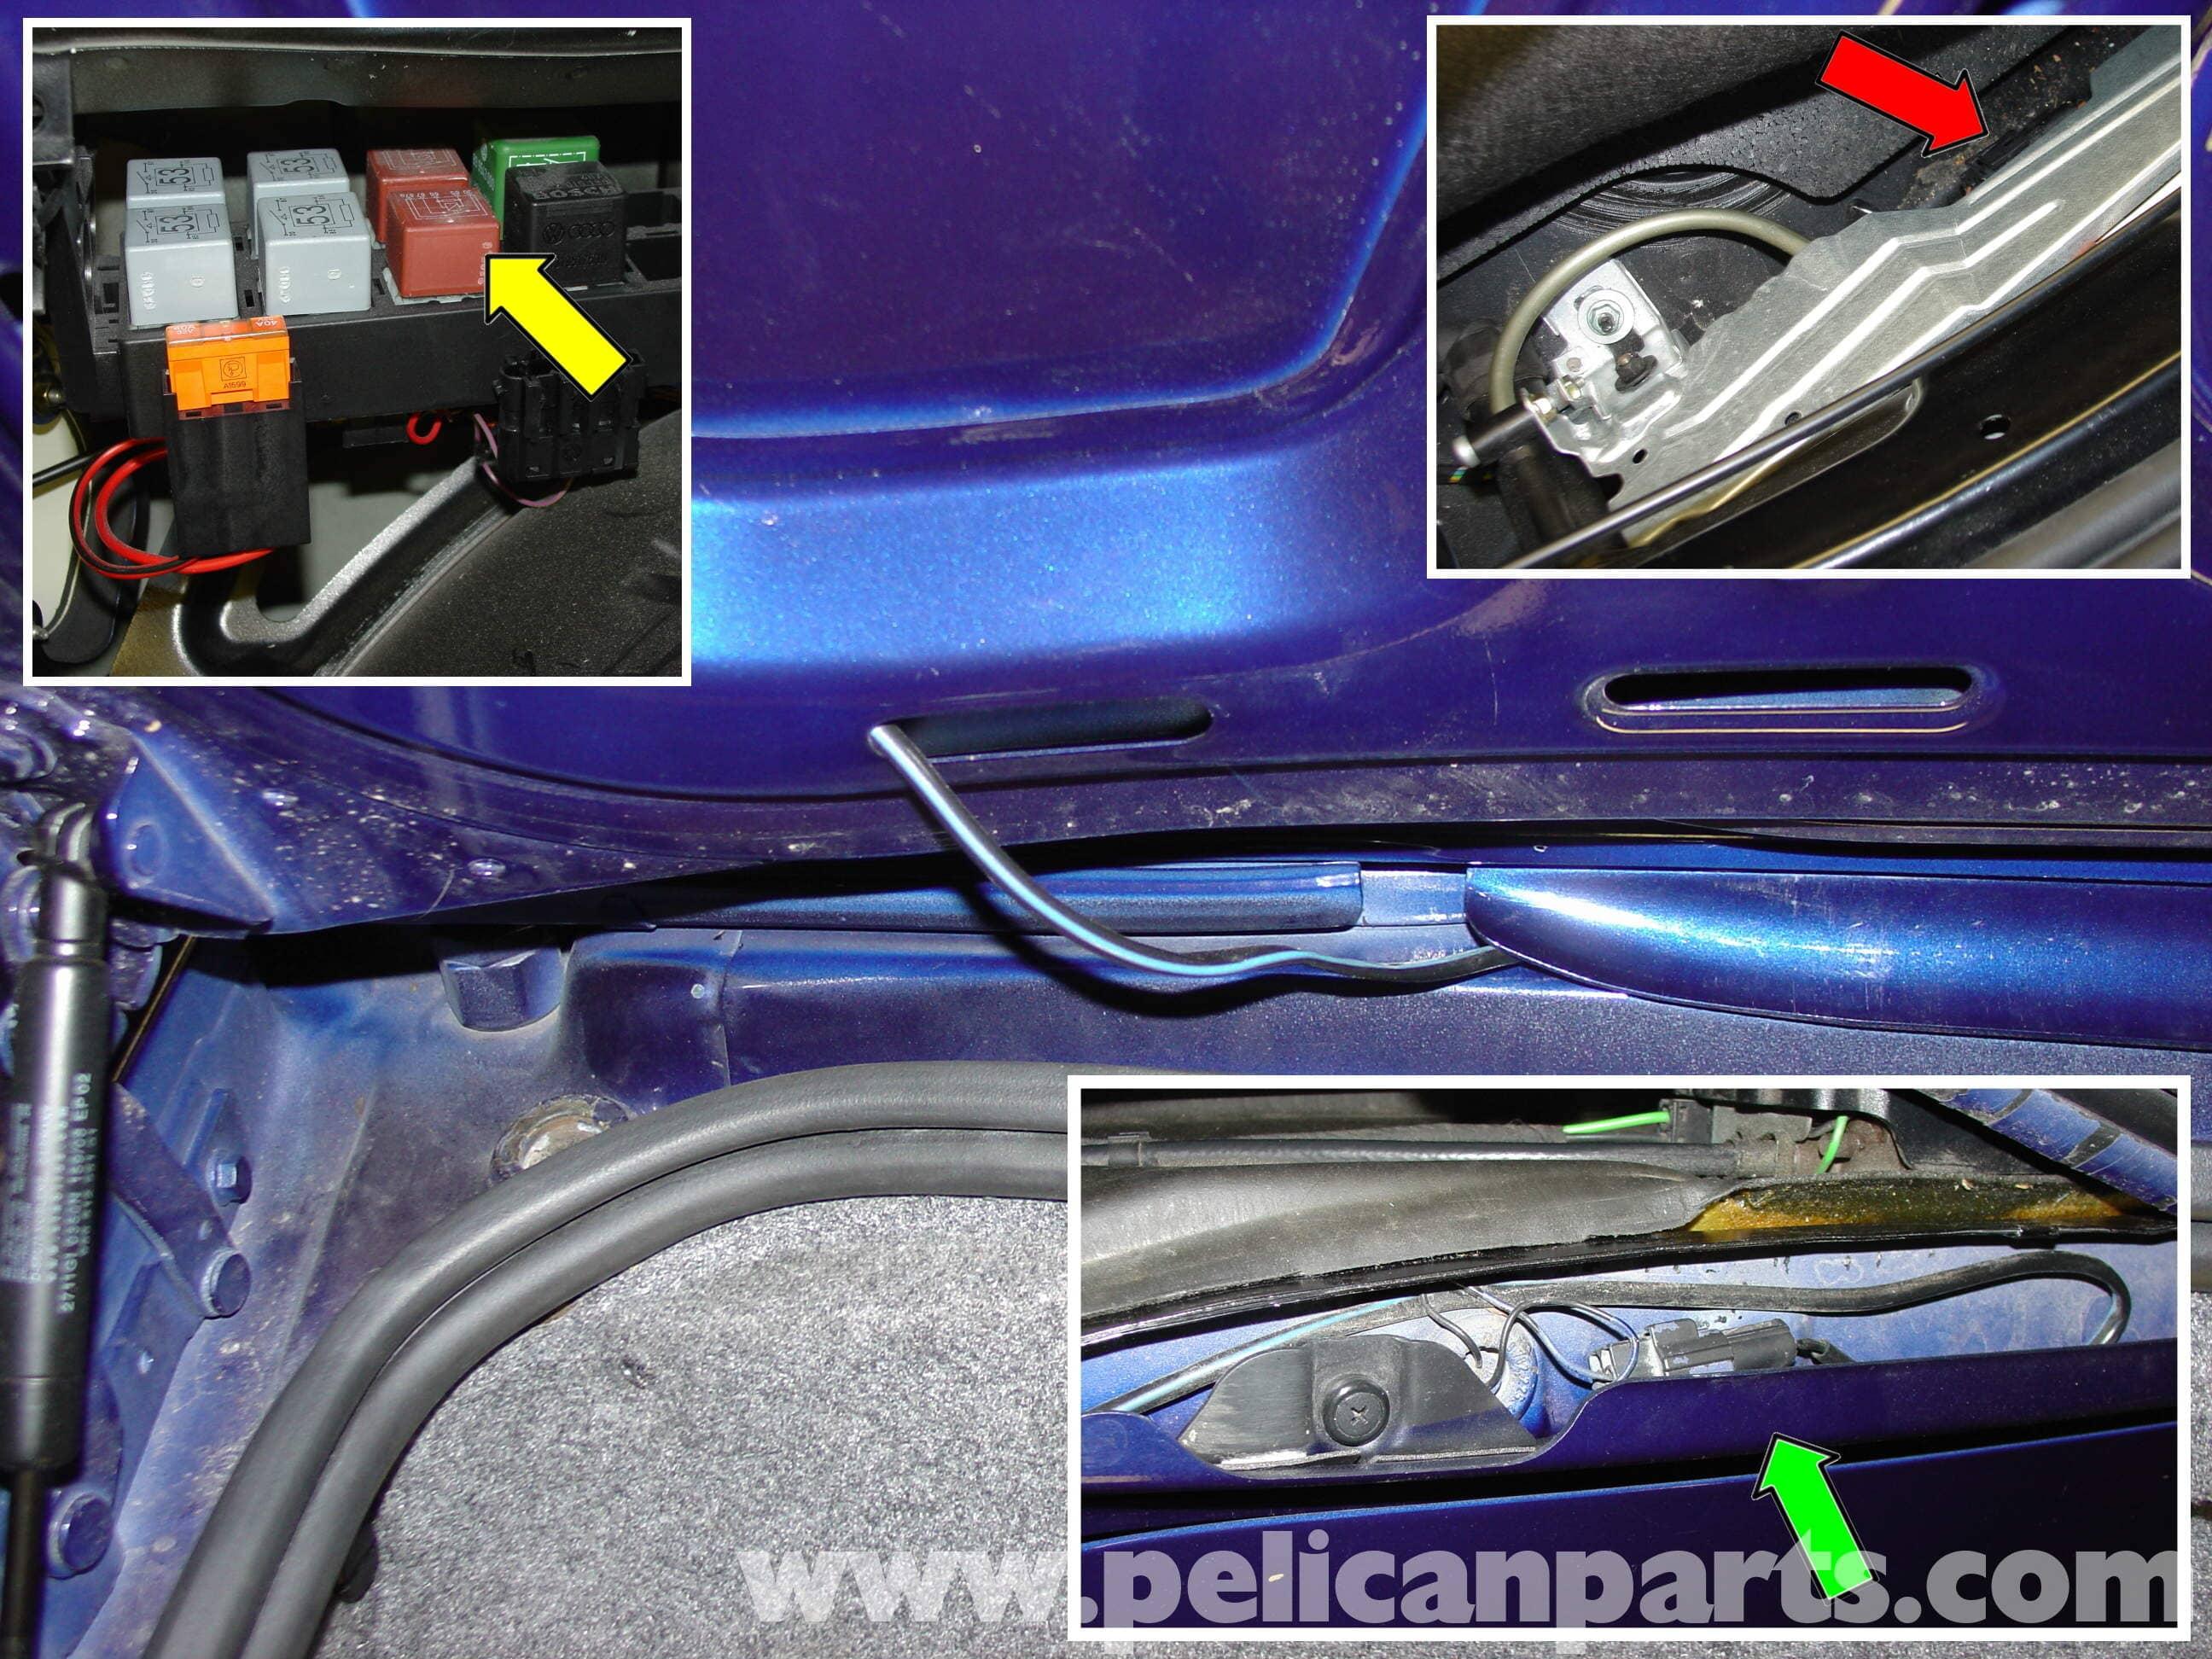 Porsche Boxster Rear Spoiler Installation 986 987 1997 08 Radio Wiring Large Image Extra